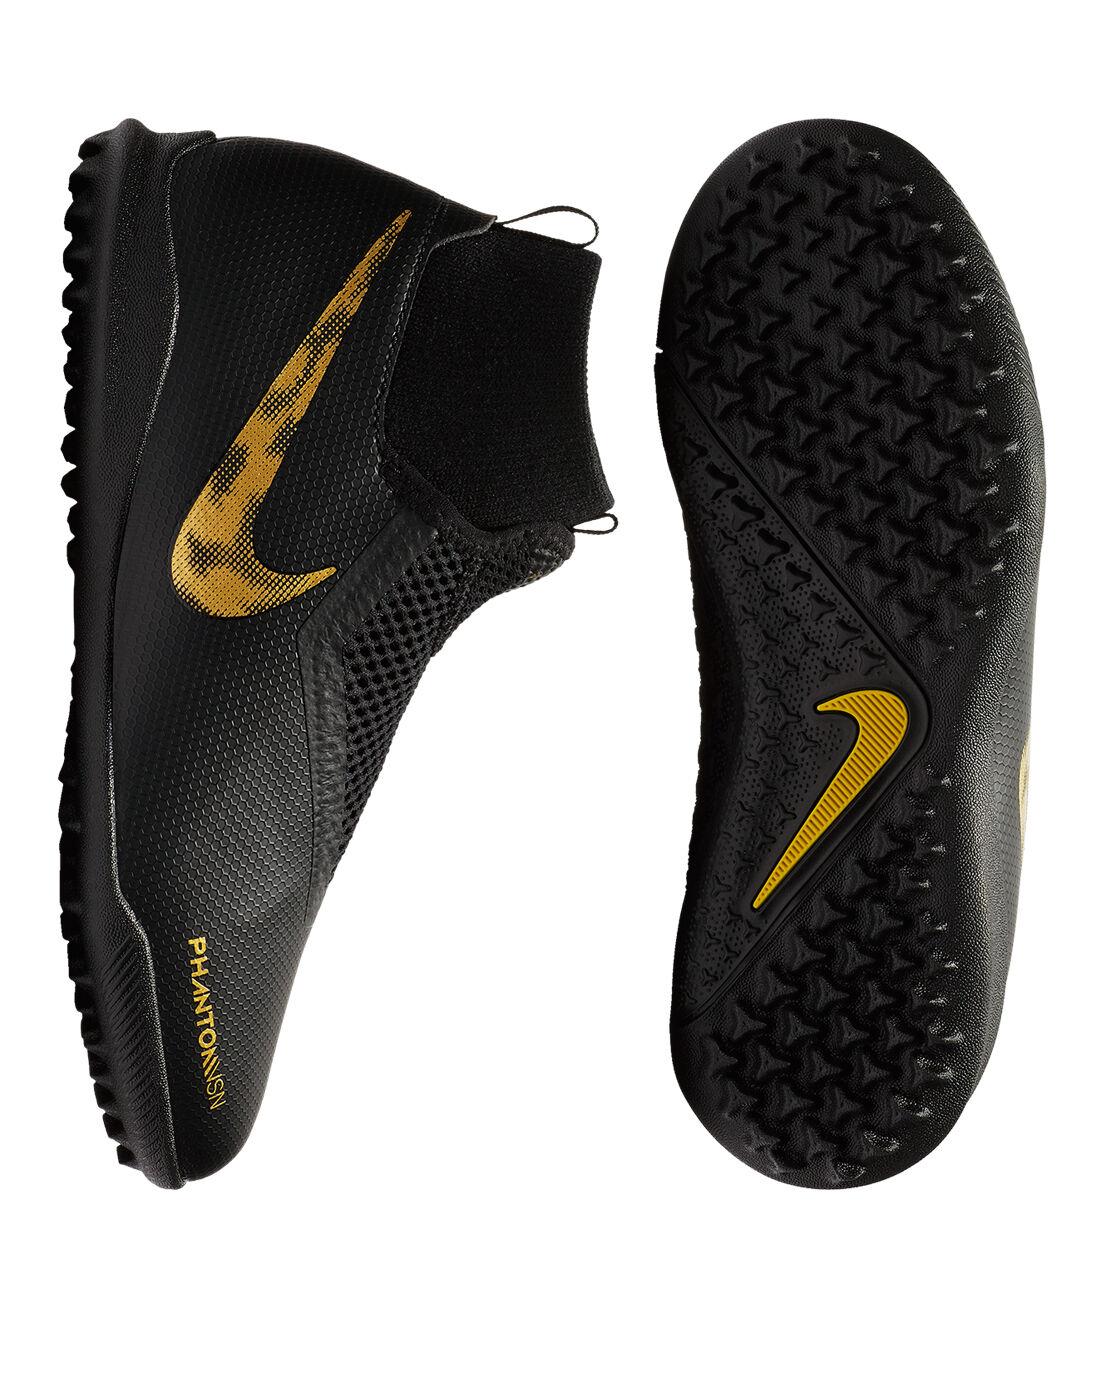 Gold Nike Phantom Vision Astro